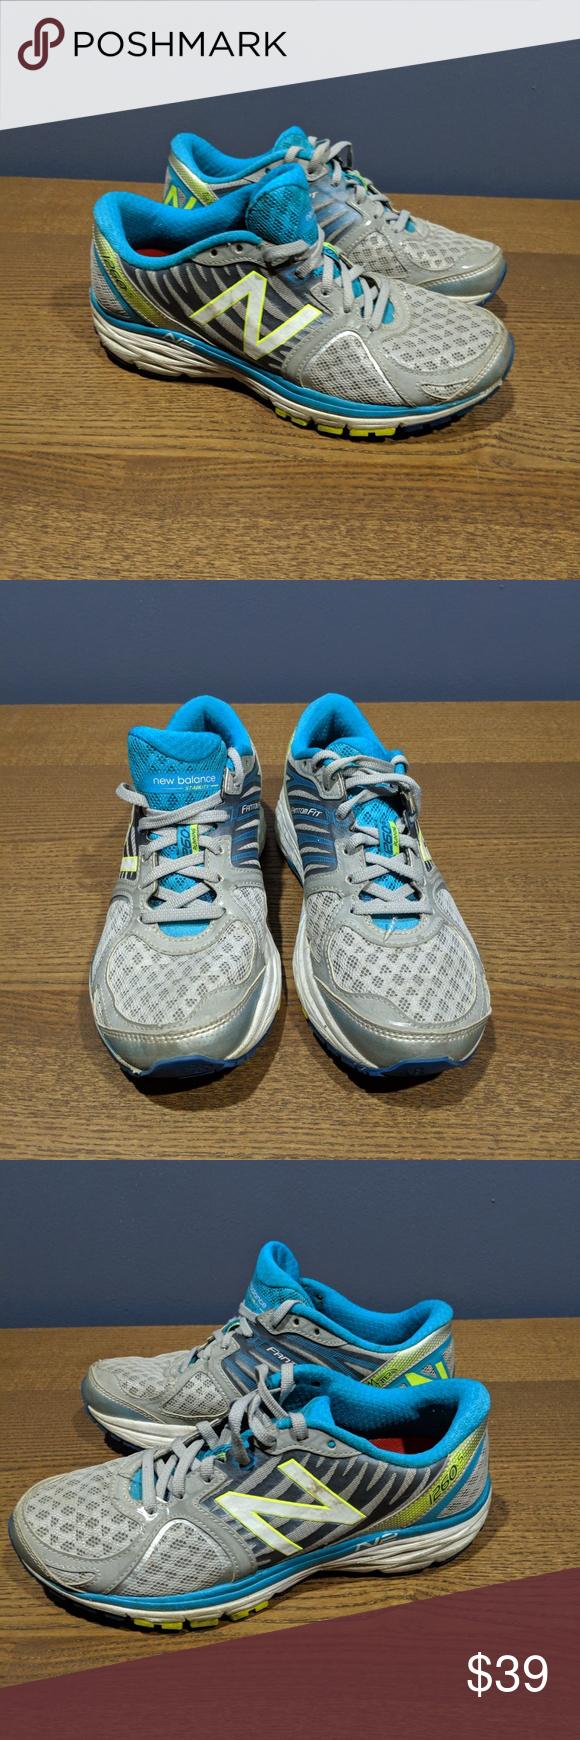 New Balance 1260 v5 N2 Fantom Fit Running Shoes Wo New